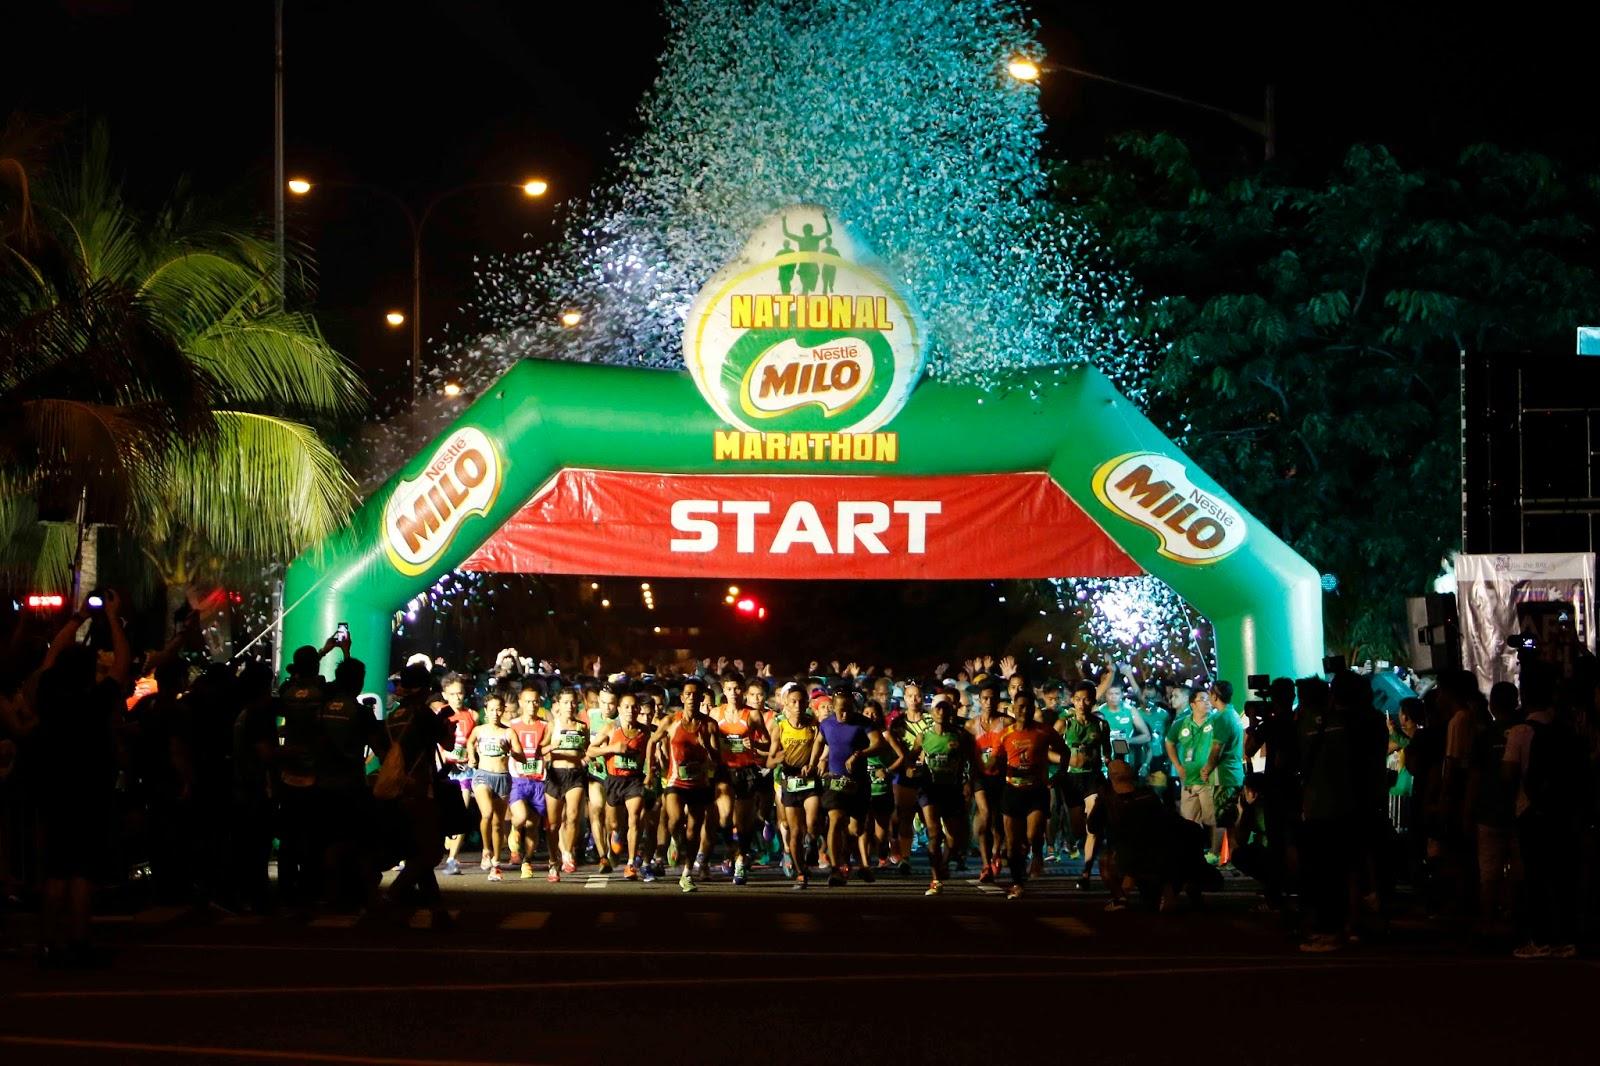 Veterans Claim Victory At The 40th Milo Marathon Metro Manila Leg Bettina Heels Belka Black Hitam 39 With Mary Joy Tablan On Her Way To Olympics Pedestal For Top Spot 42k Became Up Grabs Women Marathoners